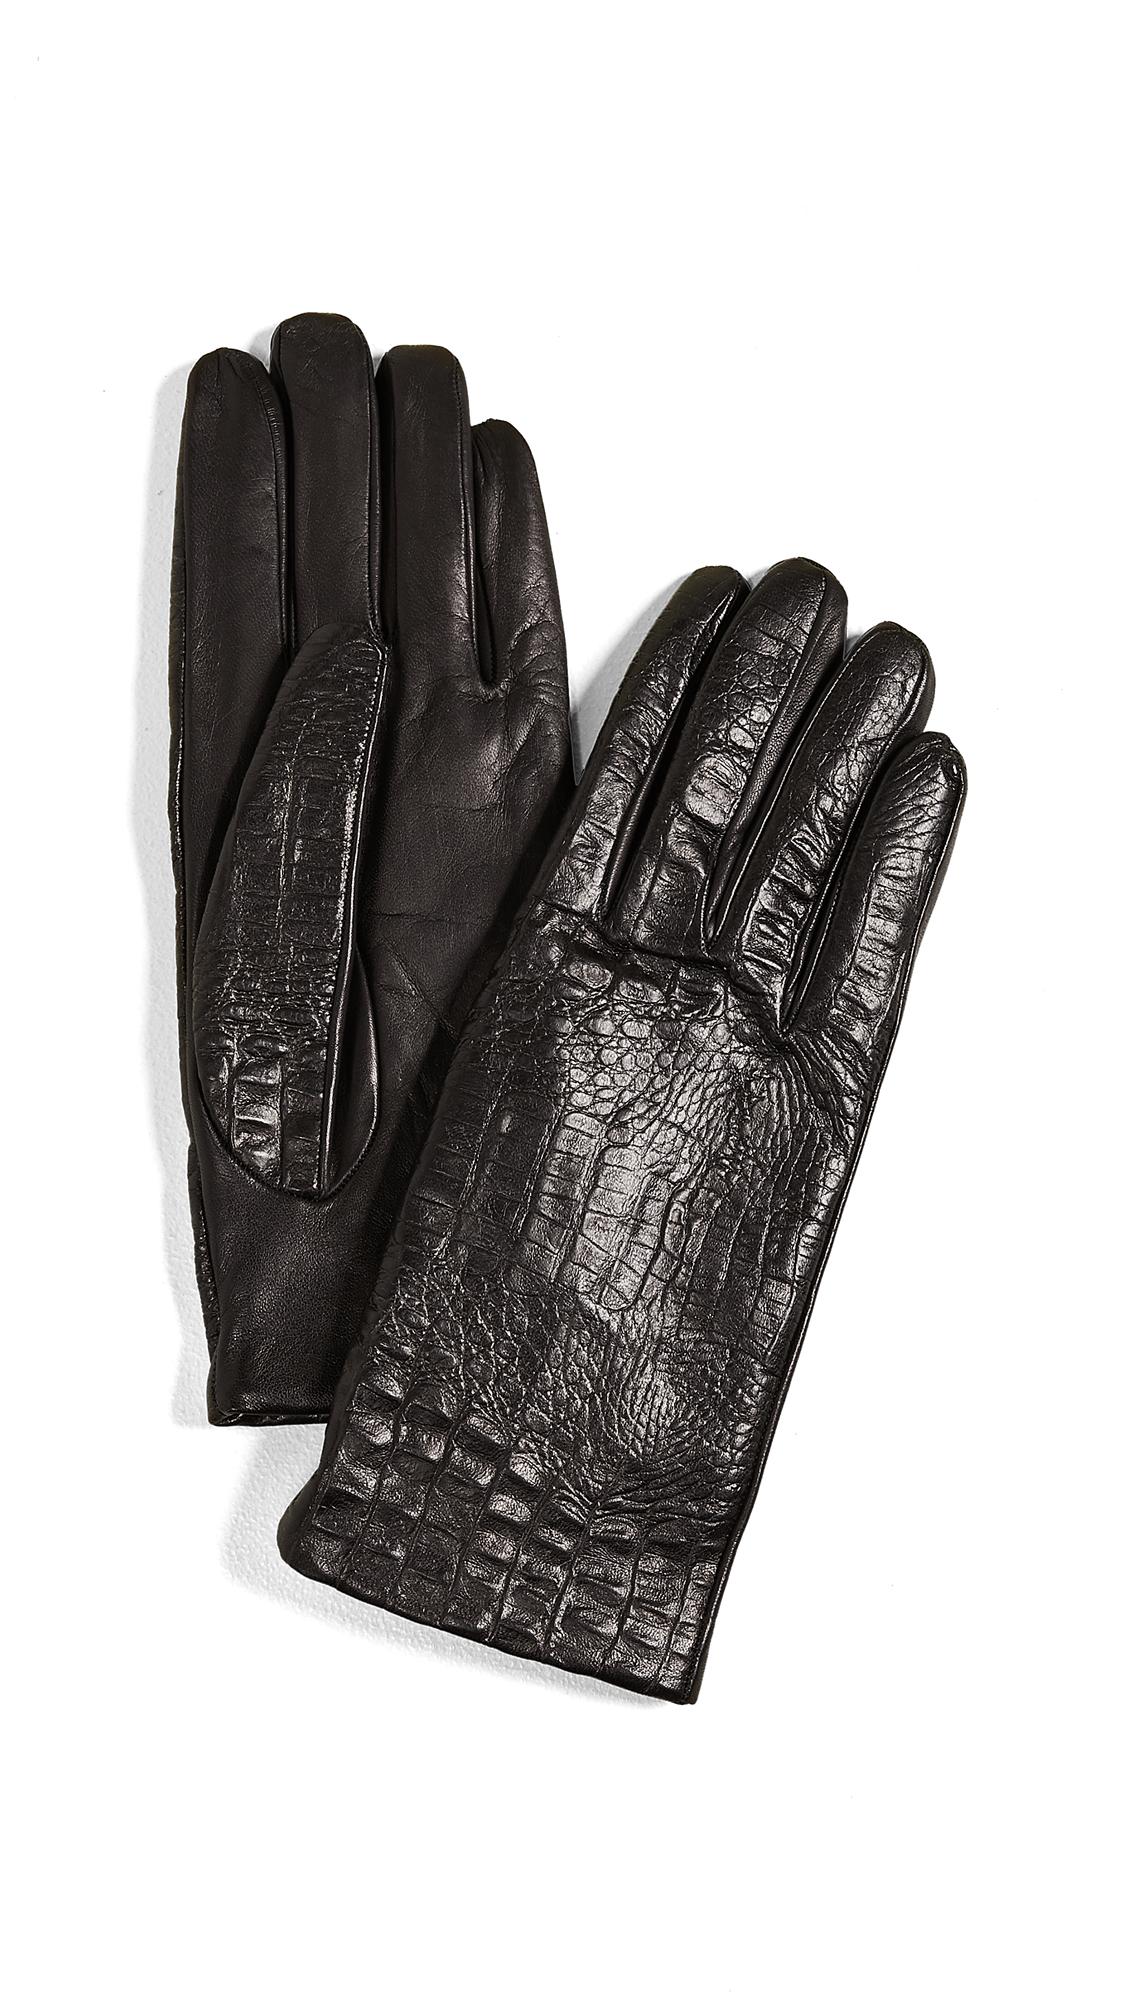 CAROLINA AMATO Croc Leather Gloves in Black